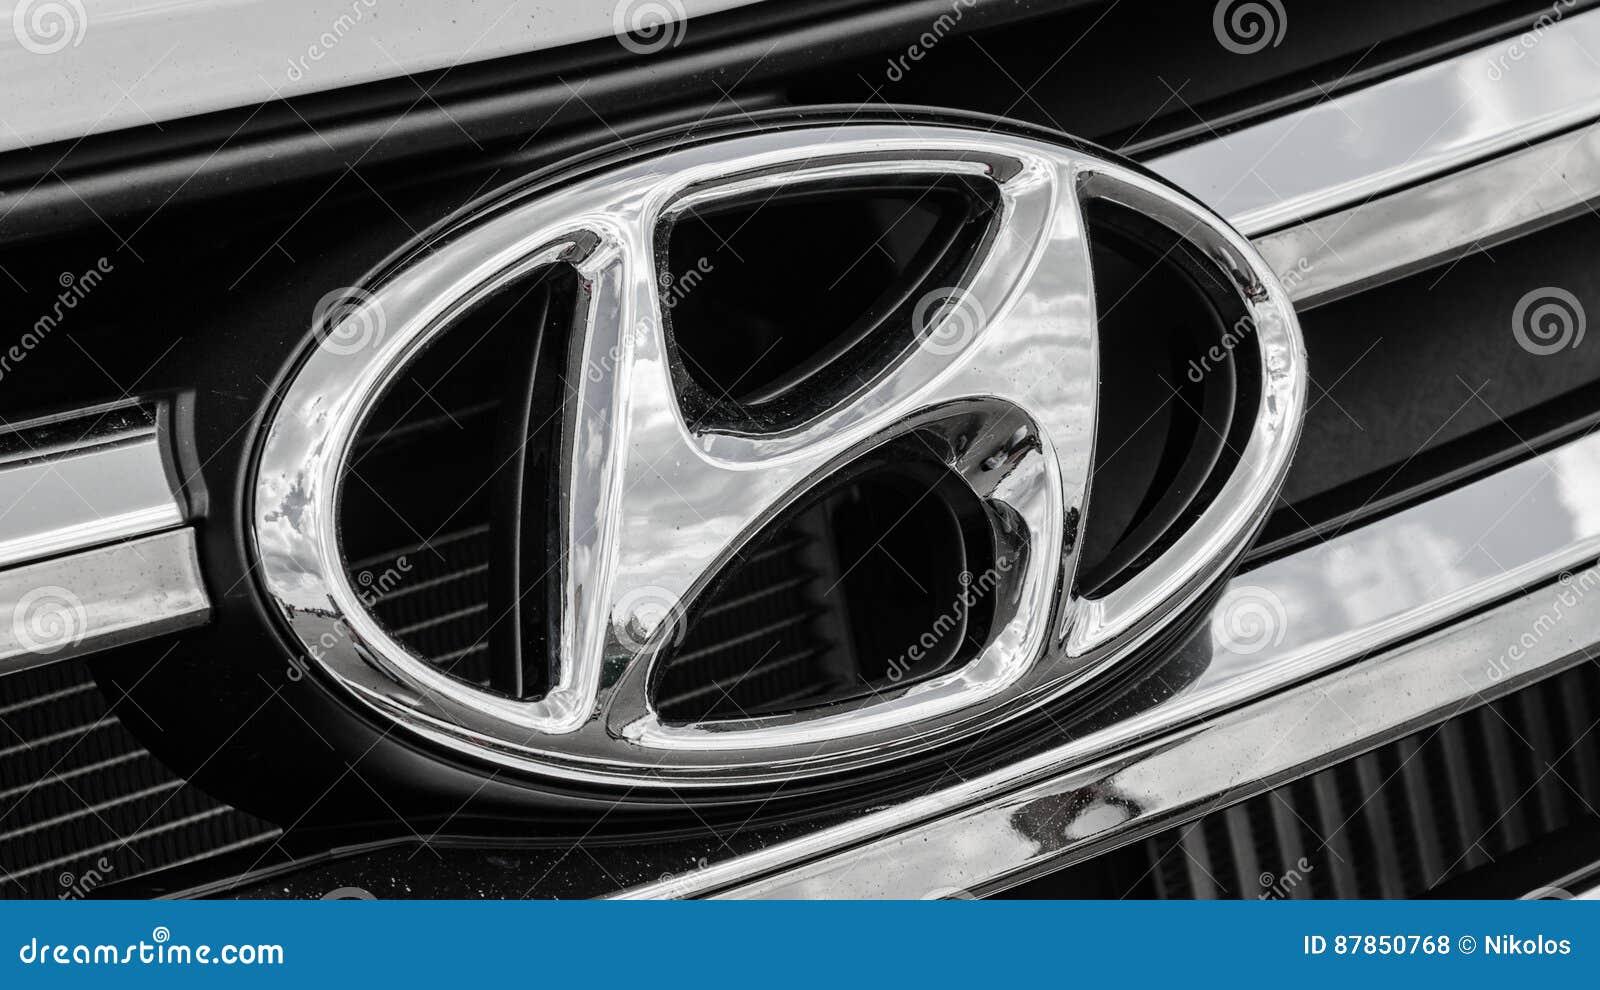 Auto Logo Hyundai Redactionele Stock Foto Afbeelding Bestaande Uit